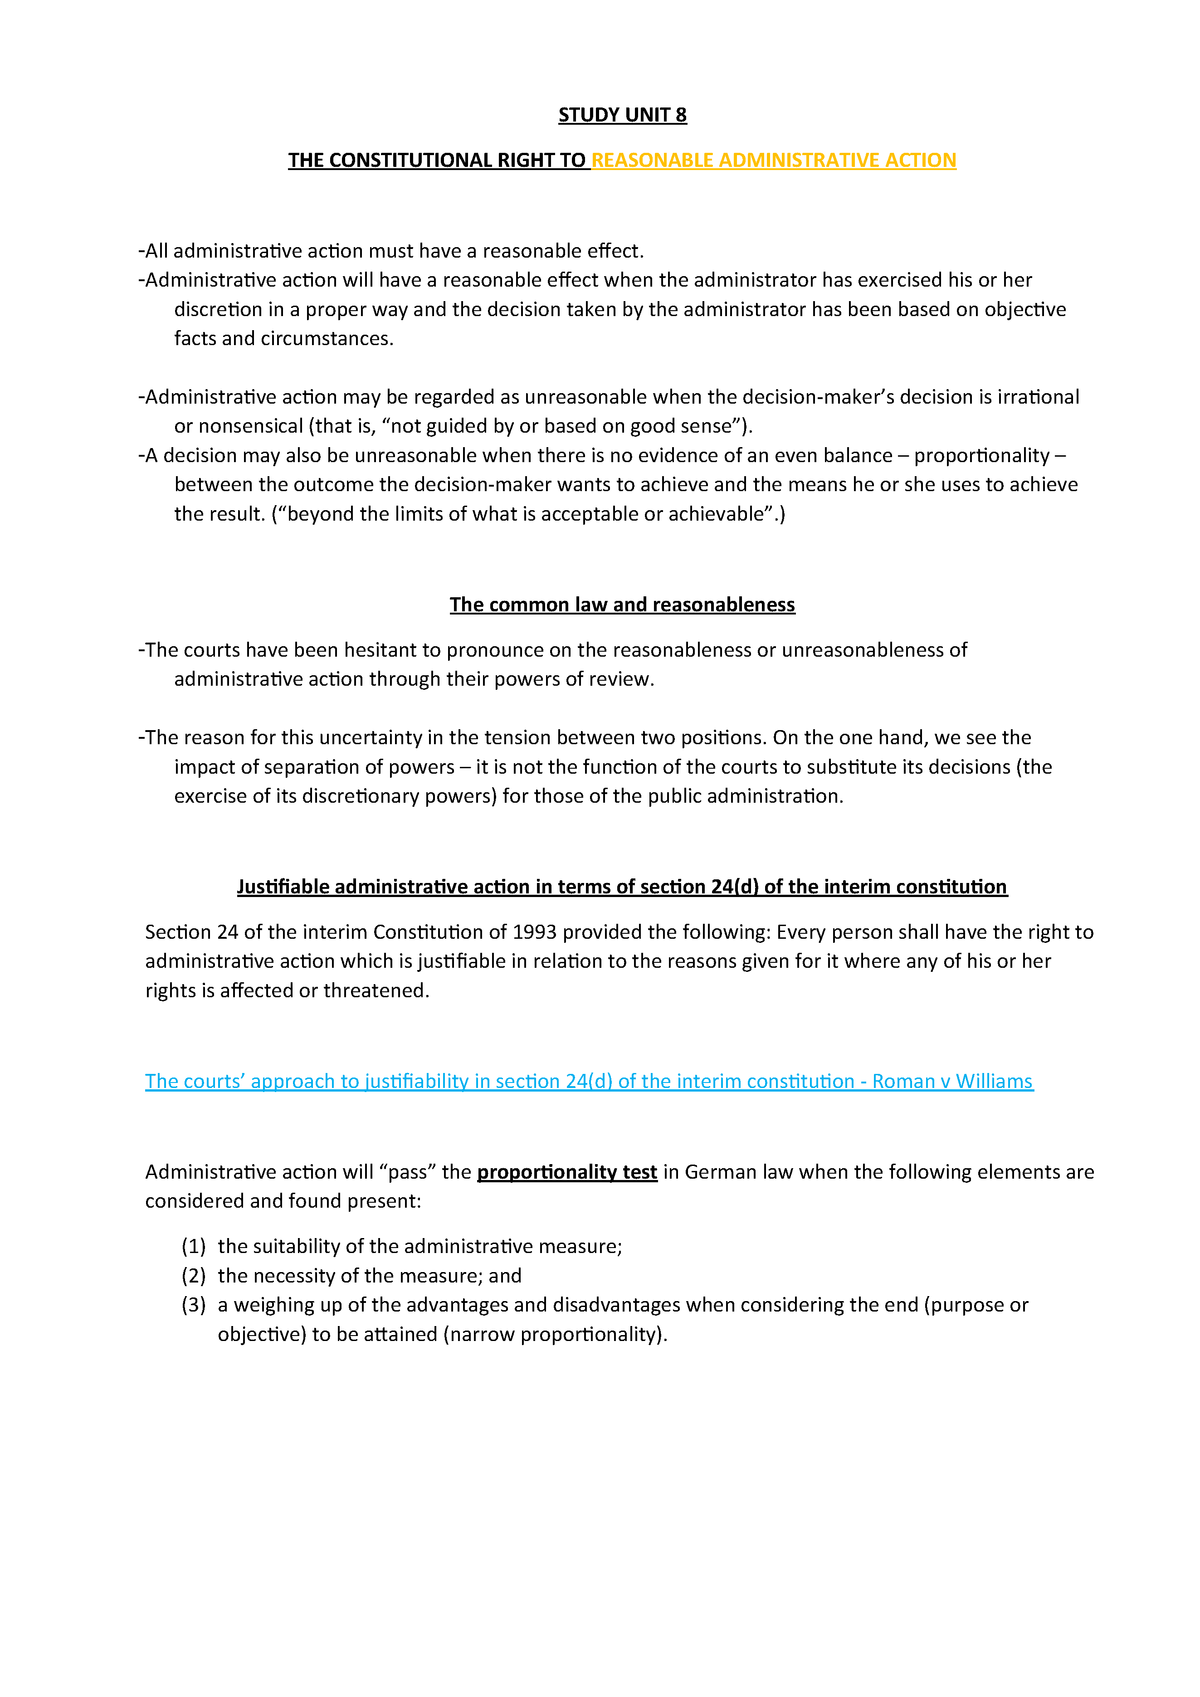 ADL Study UNIT 8 - NOtes - Administrative Law ADL2601 - StuDocu